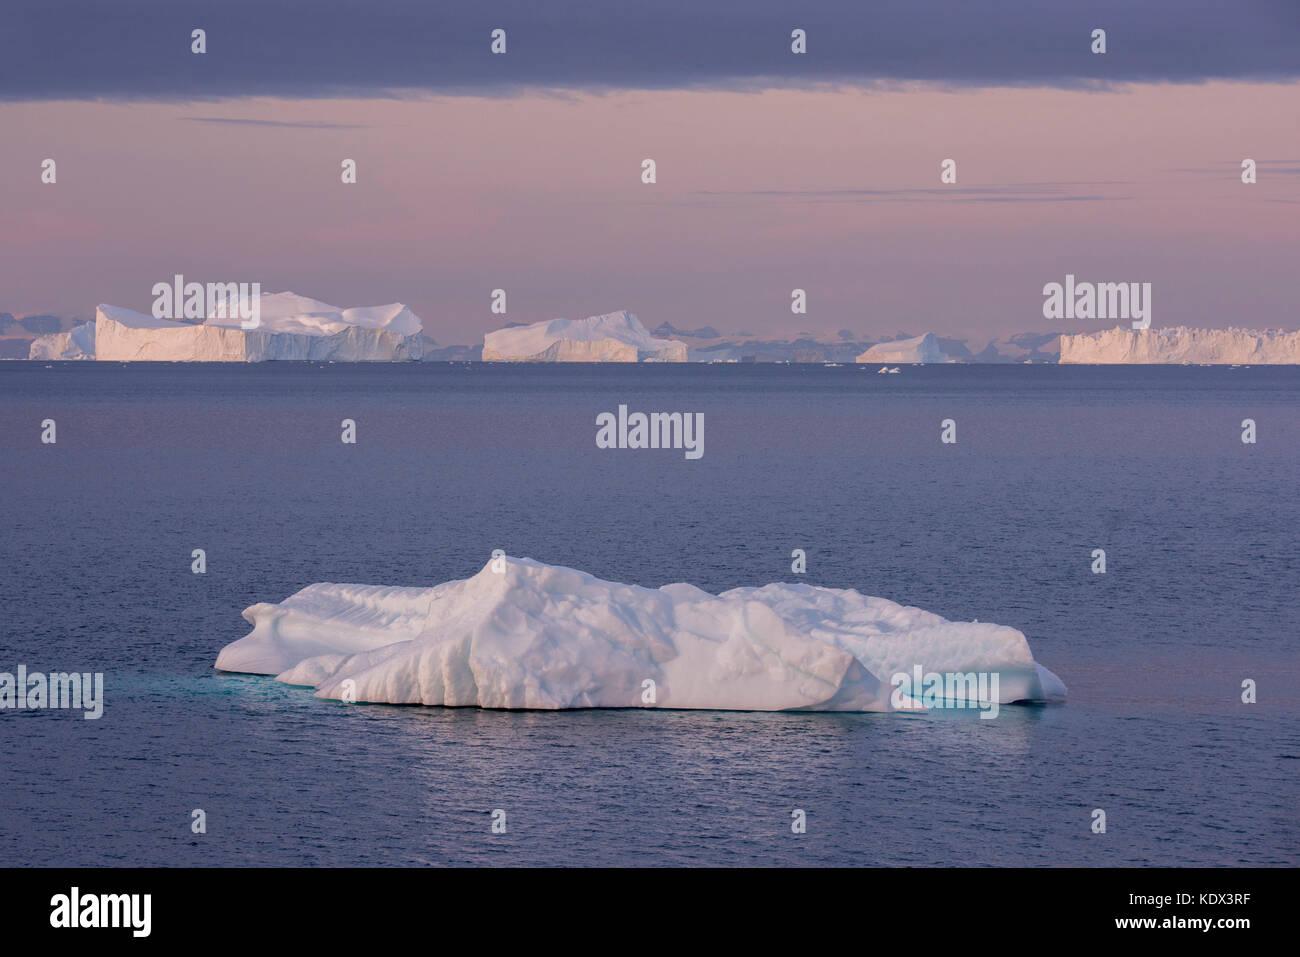 Greenland, Scoresbysund aka Scoresby Sund, Nordvestfjord. Sunrise over huge icebergs. - Stock Image